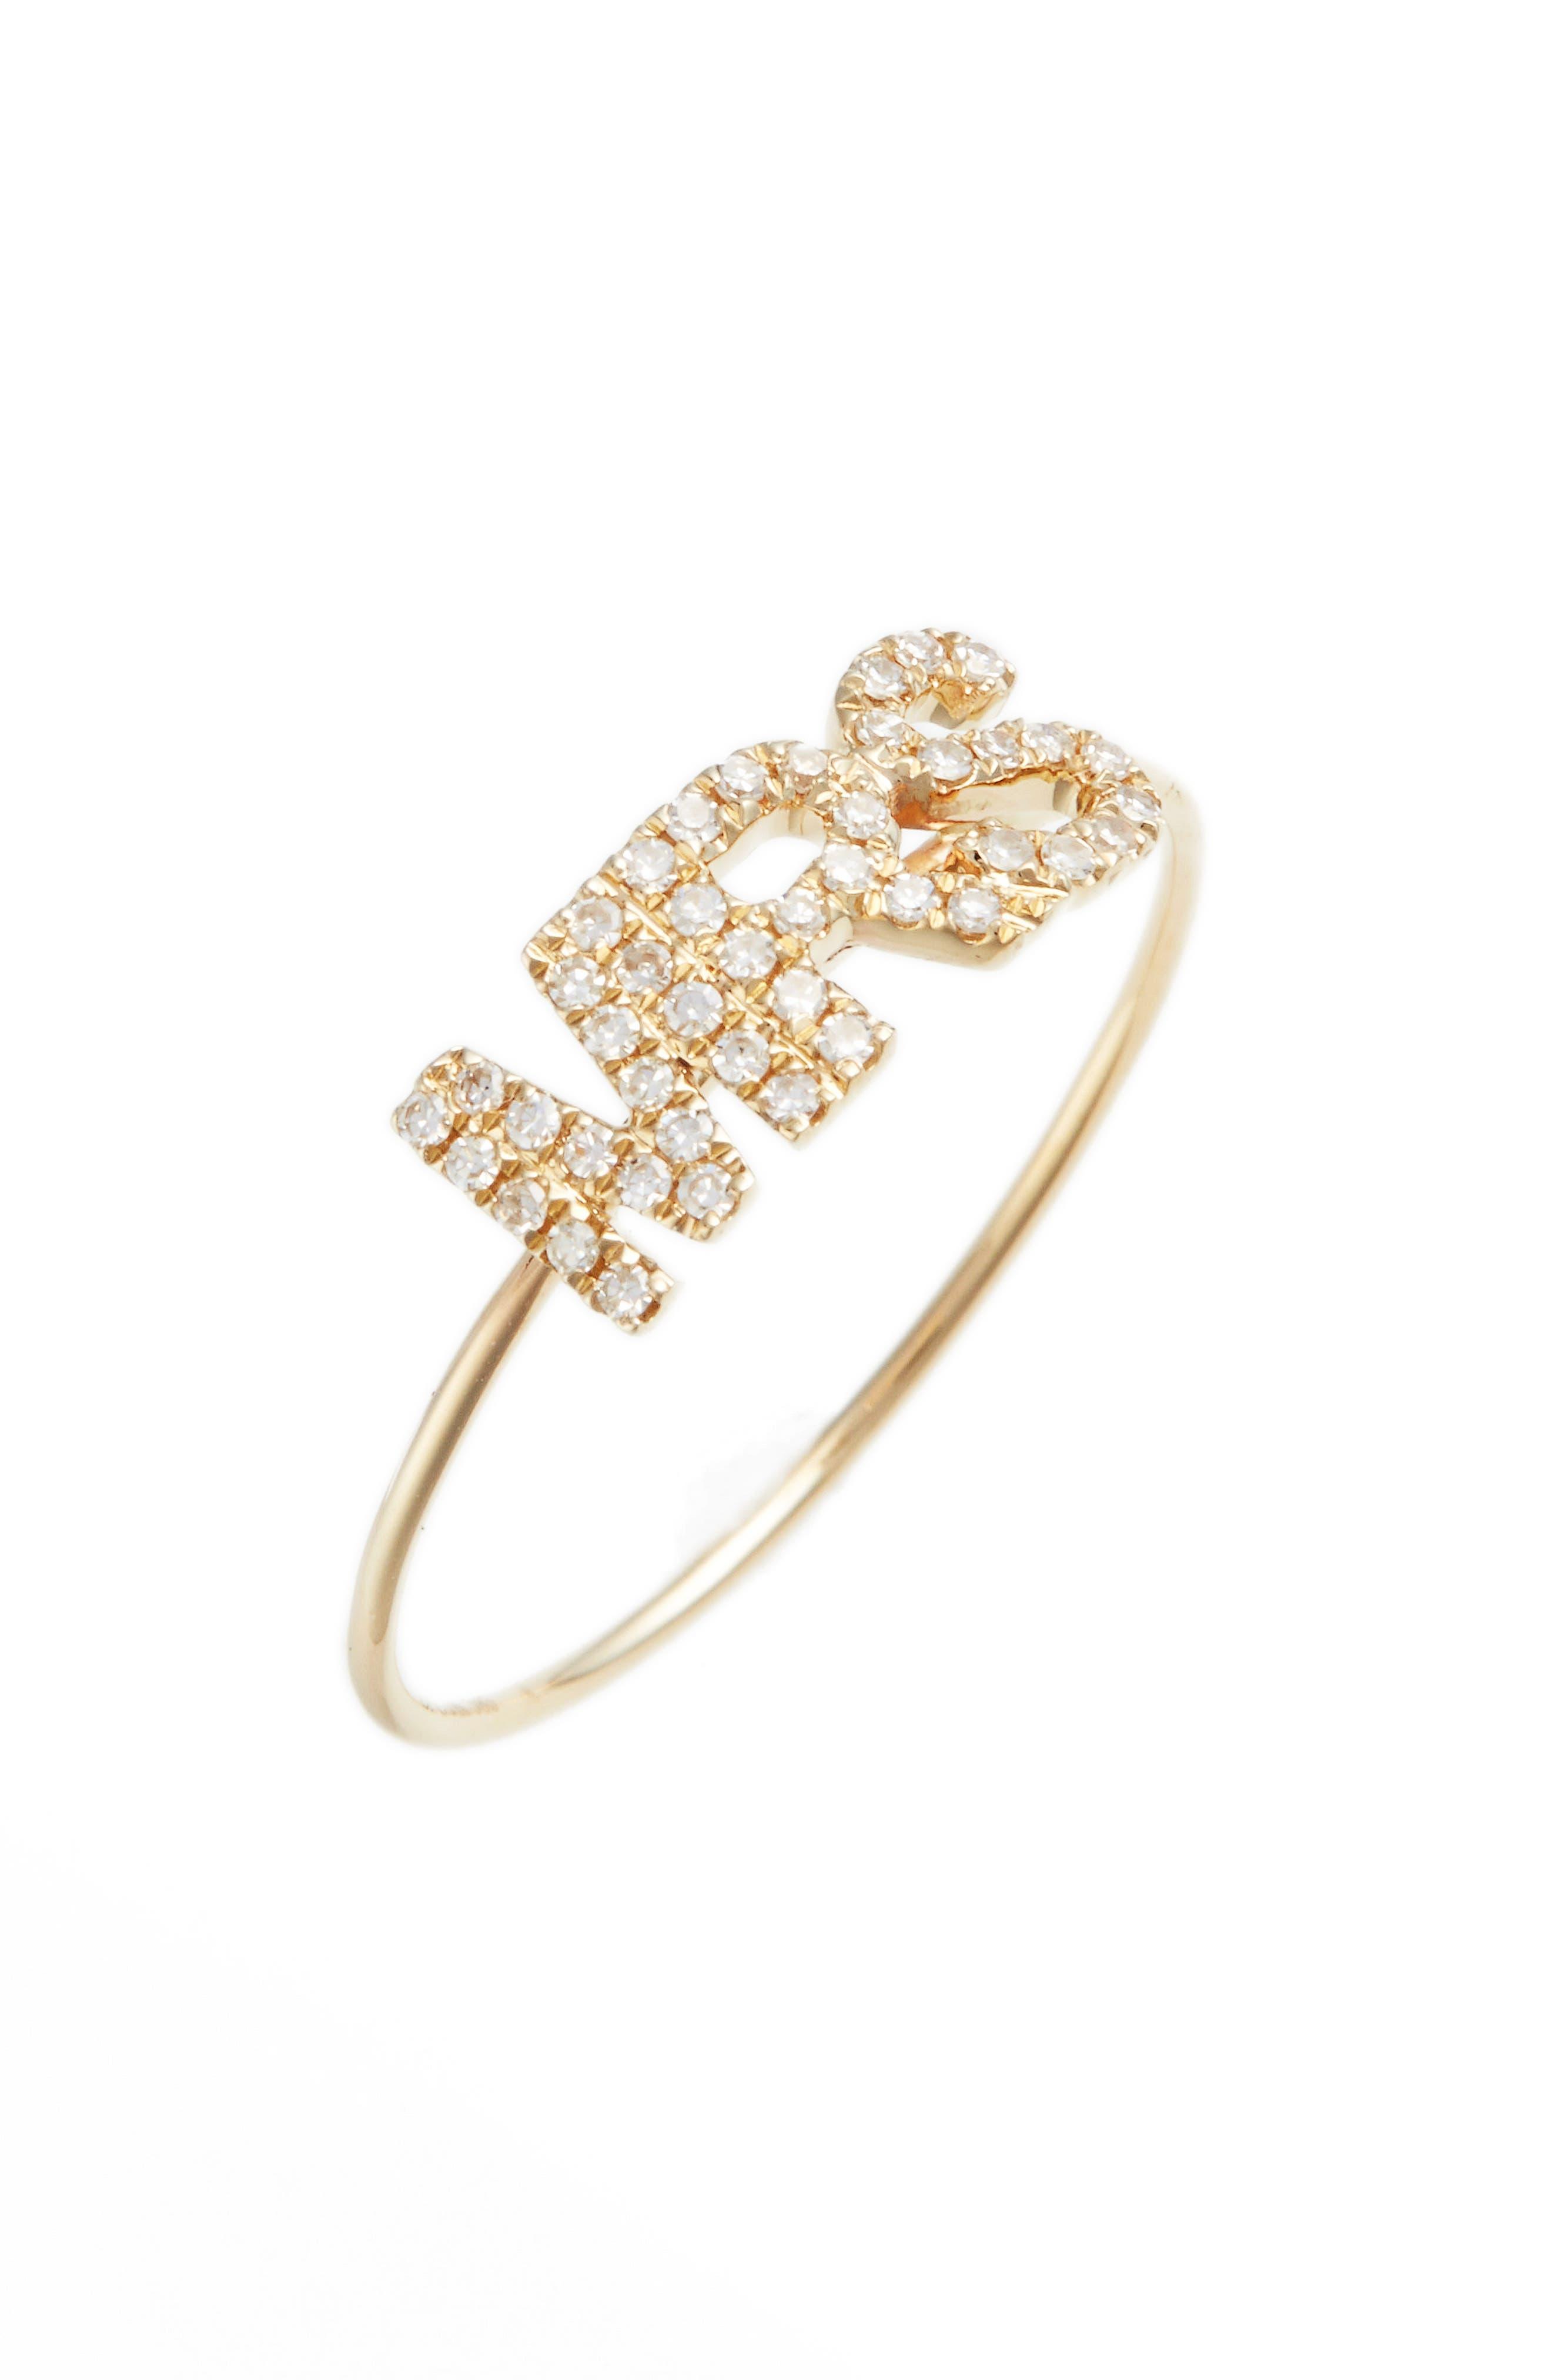 Main Image - EF COLLECTION Mrs. Diamond Ring